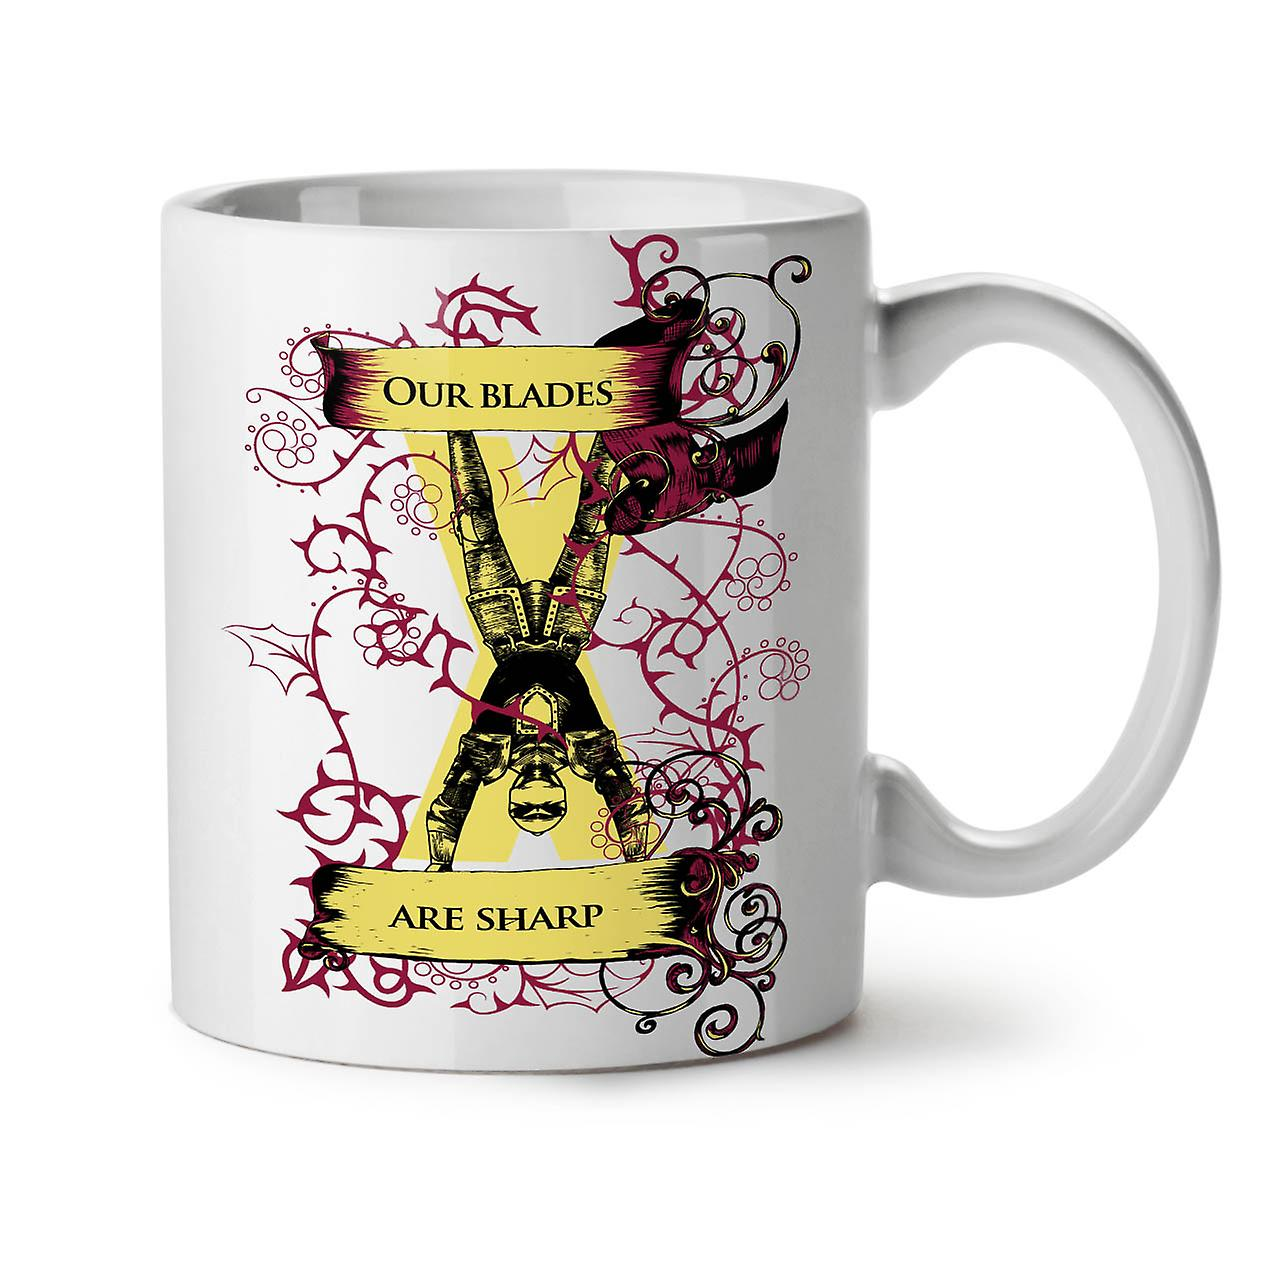 Blades Are Sharp Slogan NEW White Tea Coffee Ceramic Mug 11 oz | Wellcoda